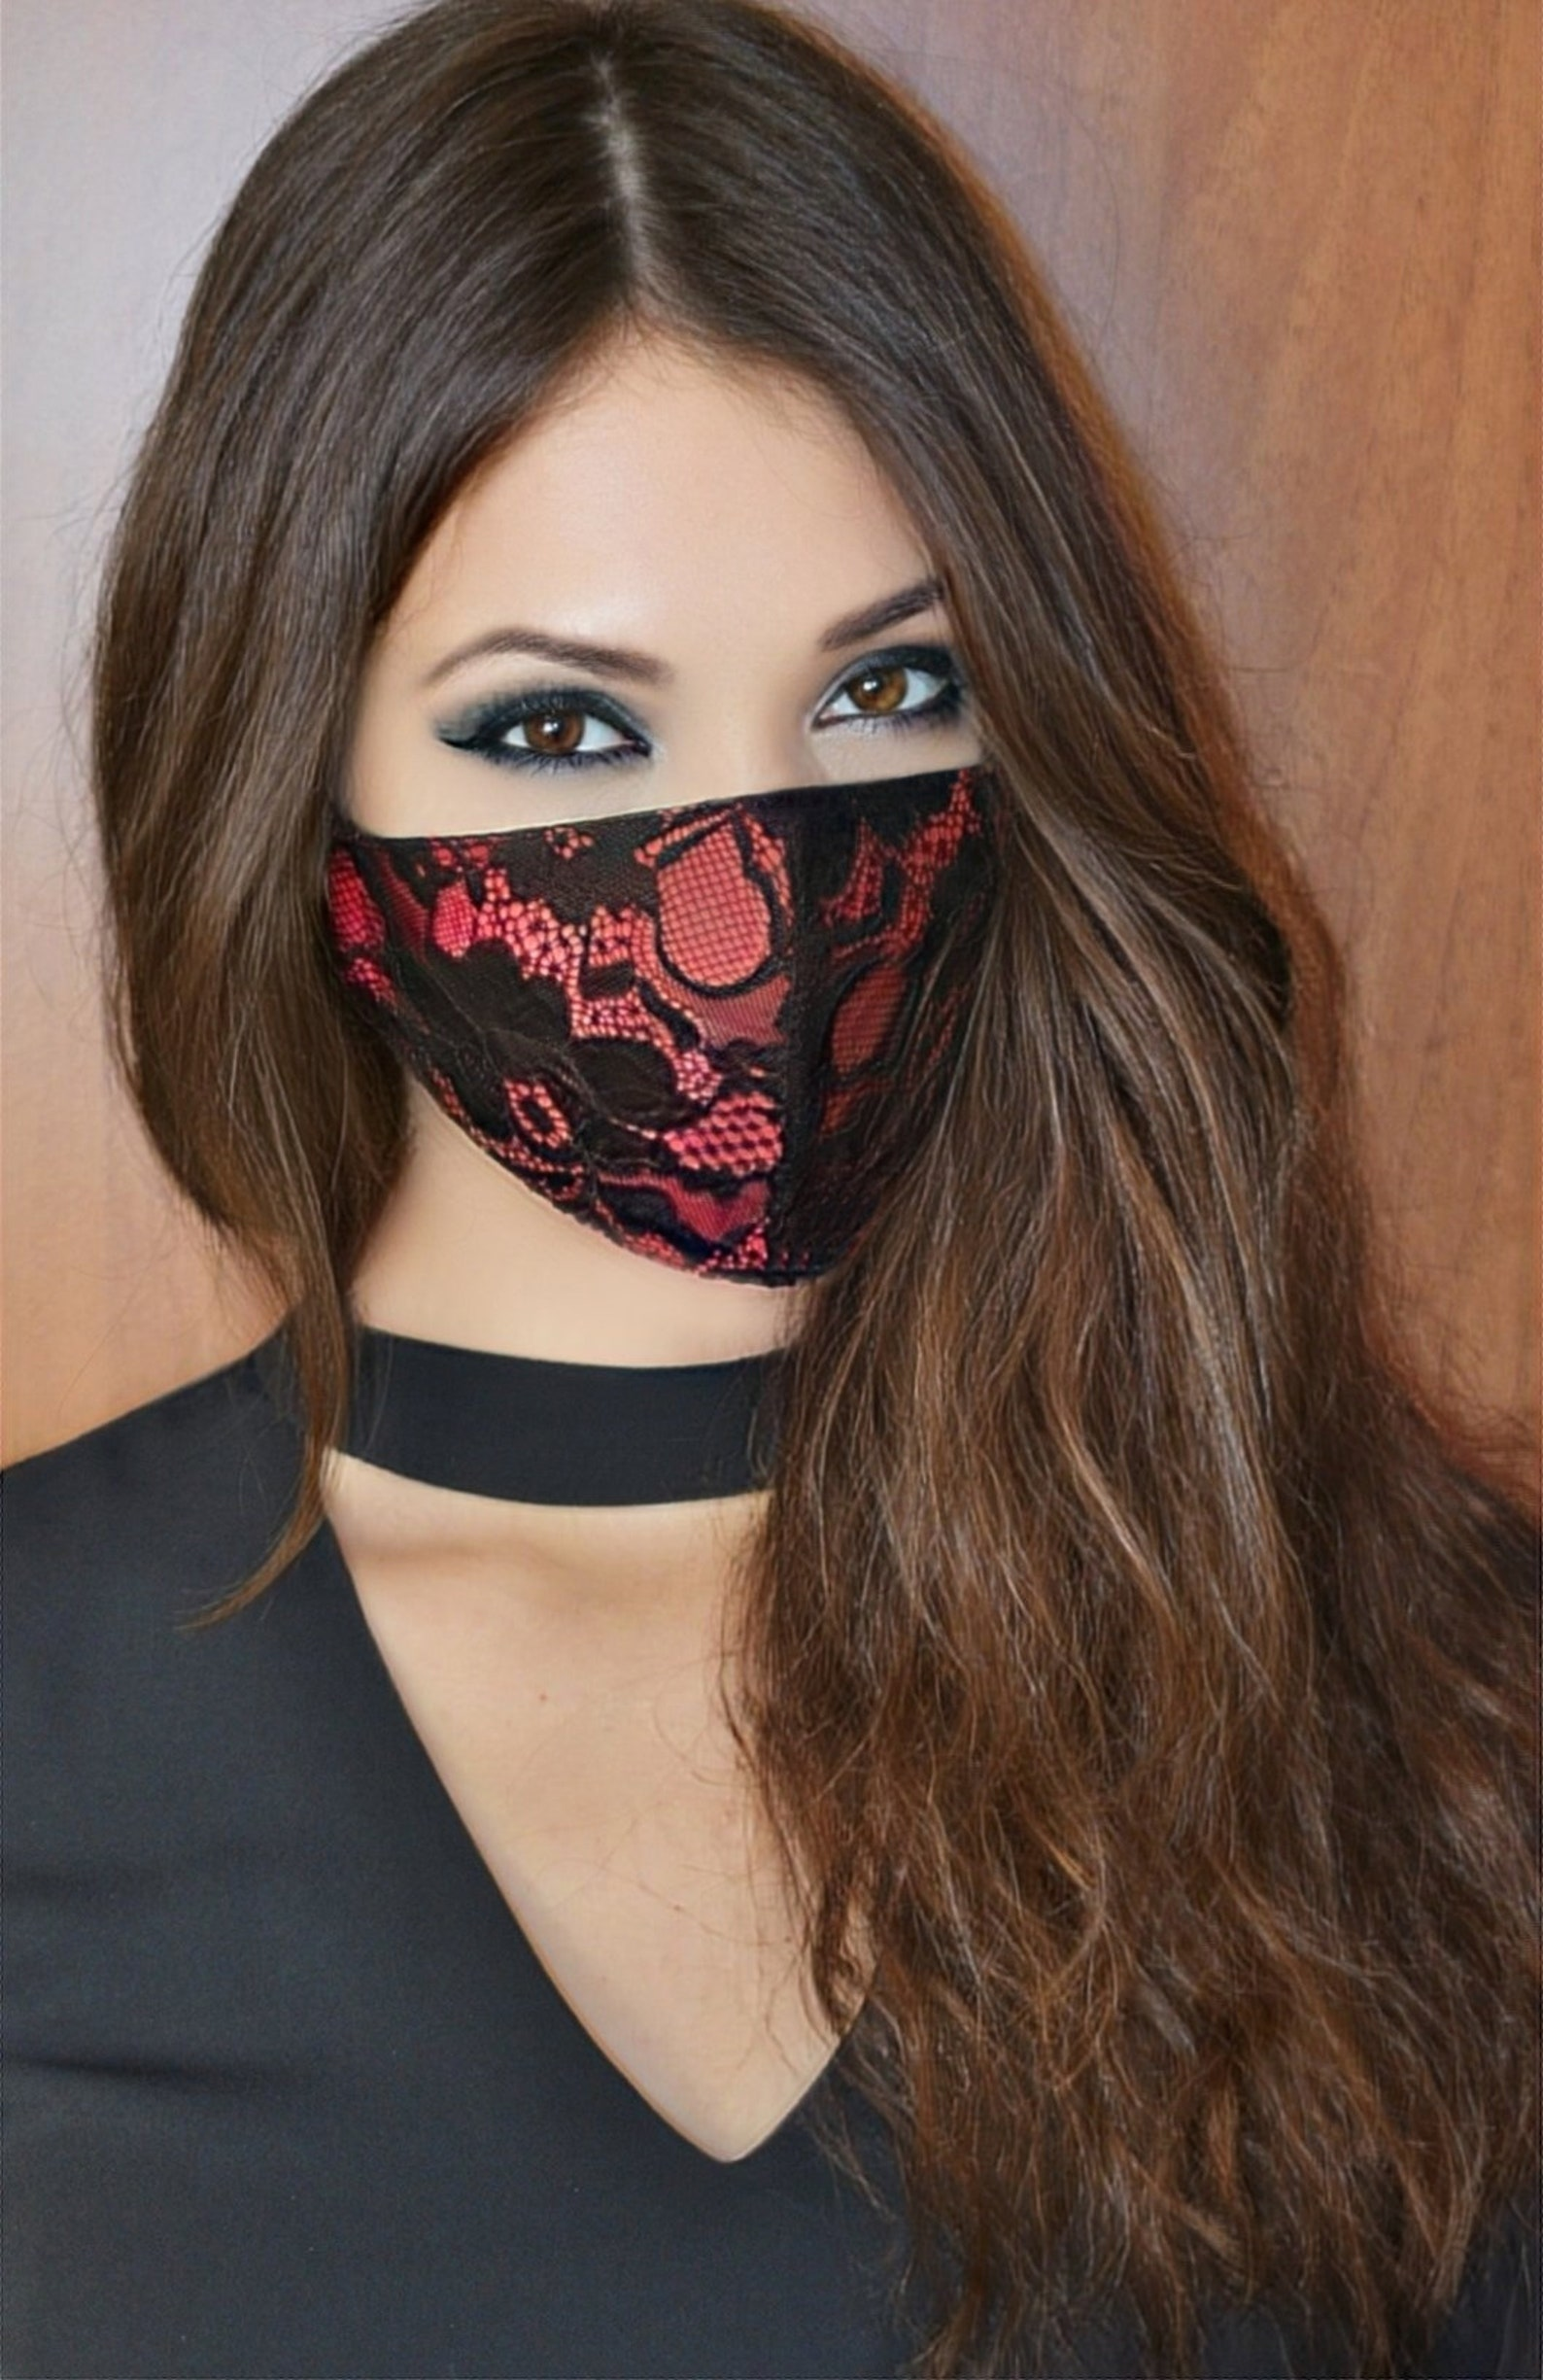 Designer Face Masks Available on Etsy